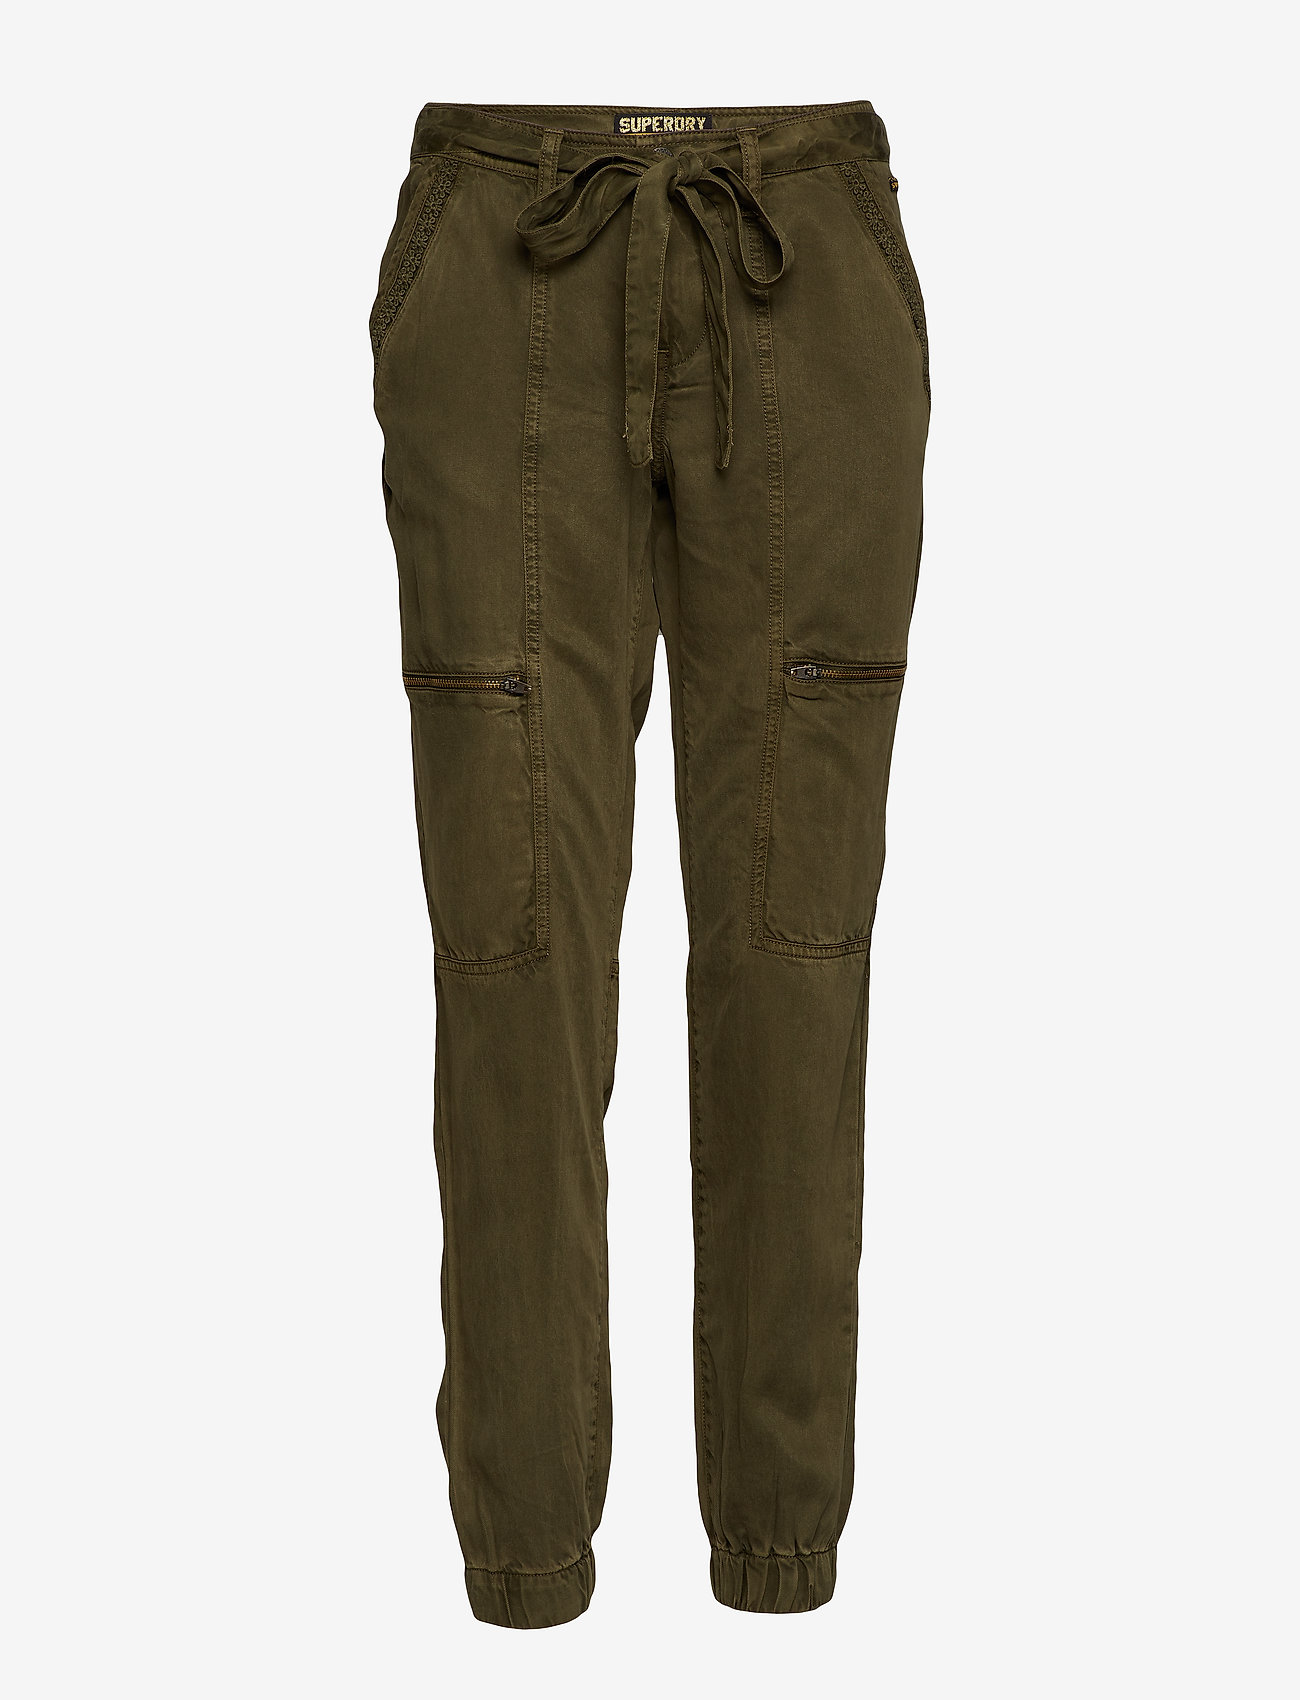 Superdry - LACE ROOKIE PANT - spodnie dresowe - laurel khaki - 0